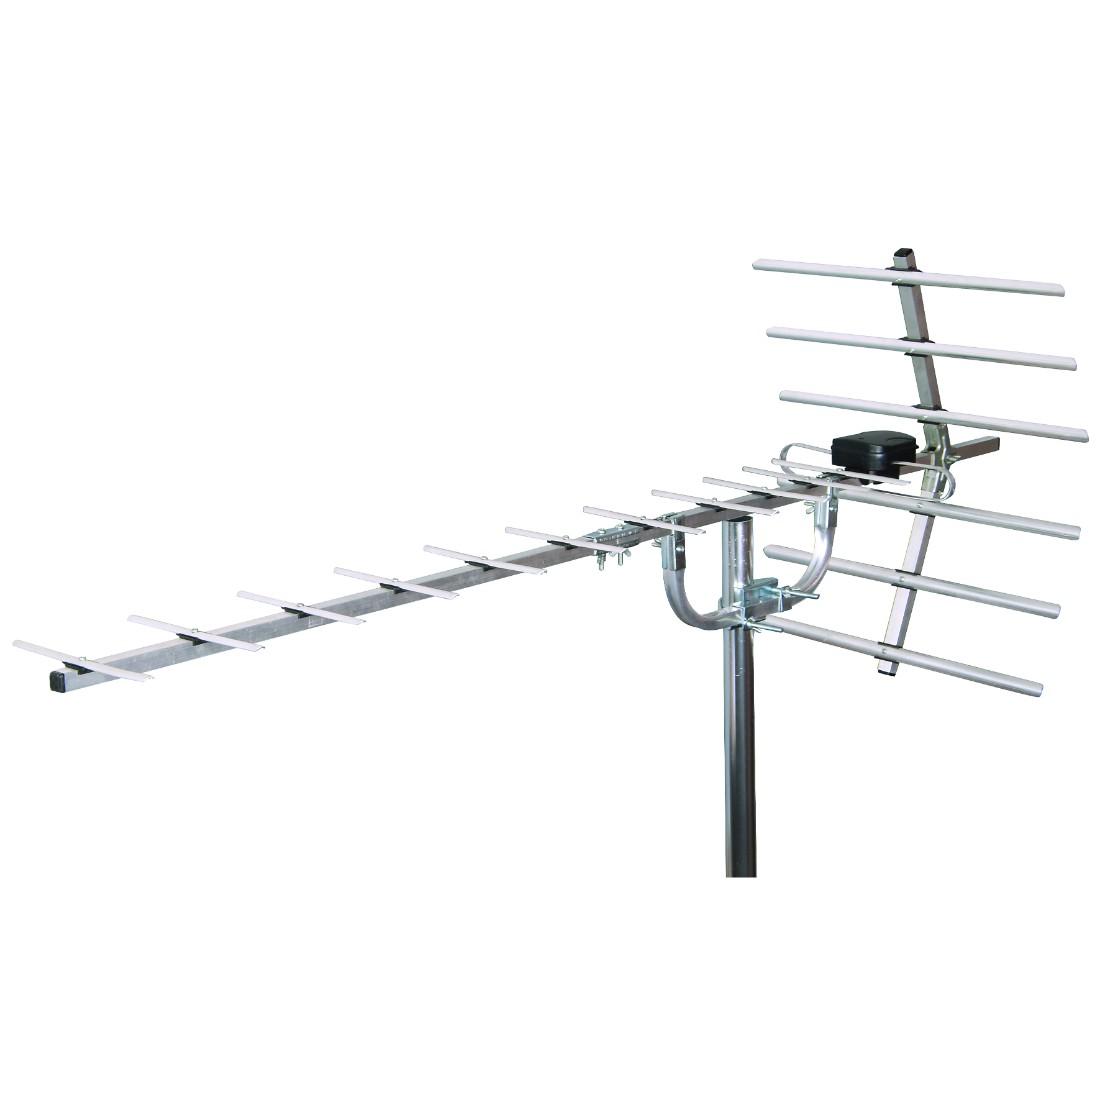 Slx 4g 18 Element Digital Tv Aerial